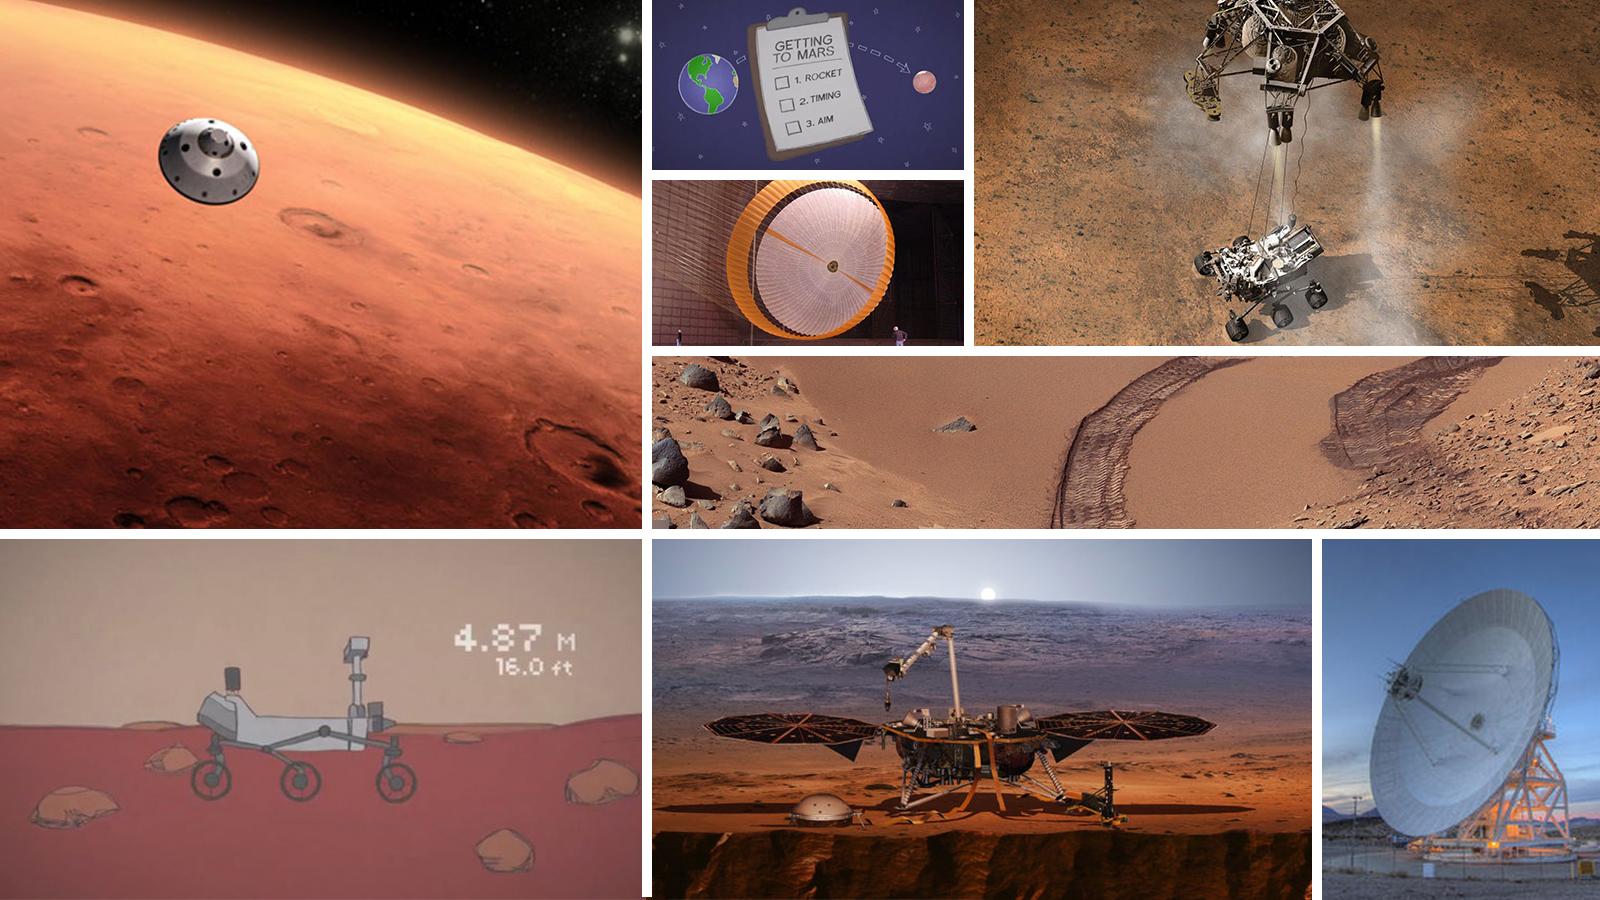 Mission to Mars Unit Activity | NASA/JPL Edu